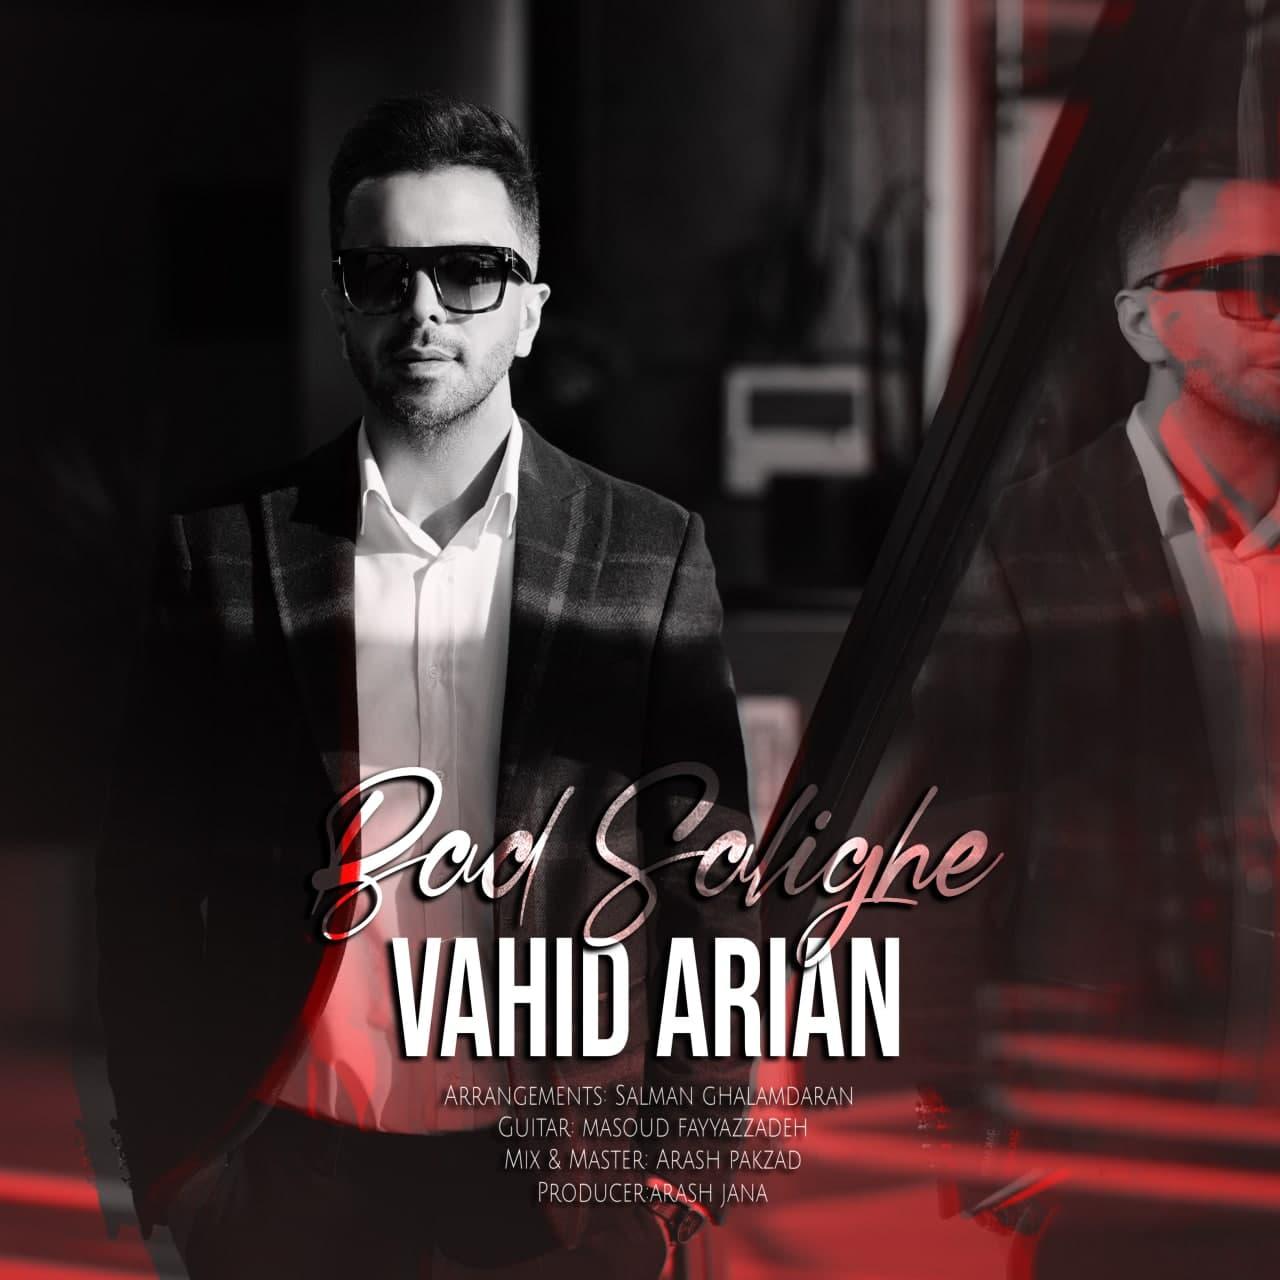 Vahid Arian – Bad Salighe